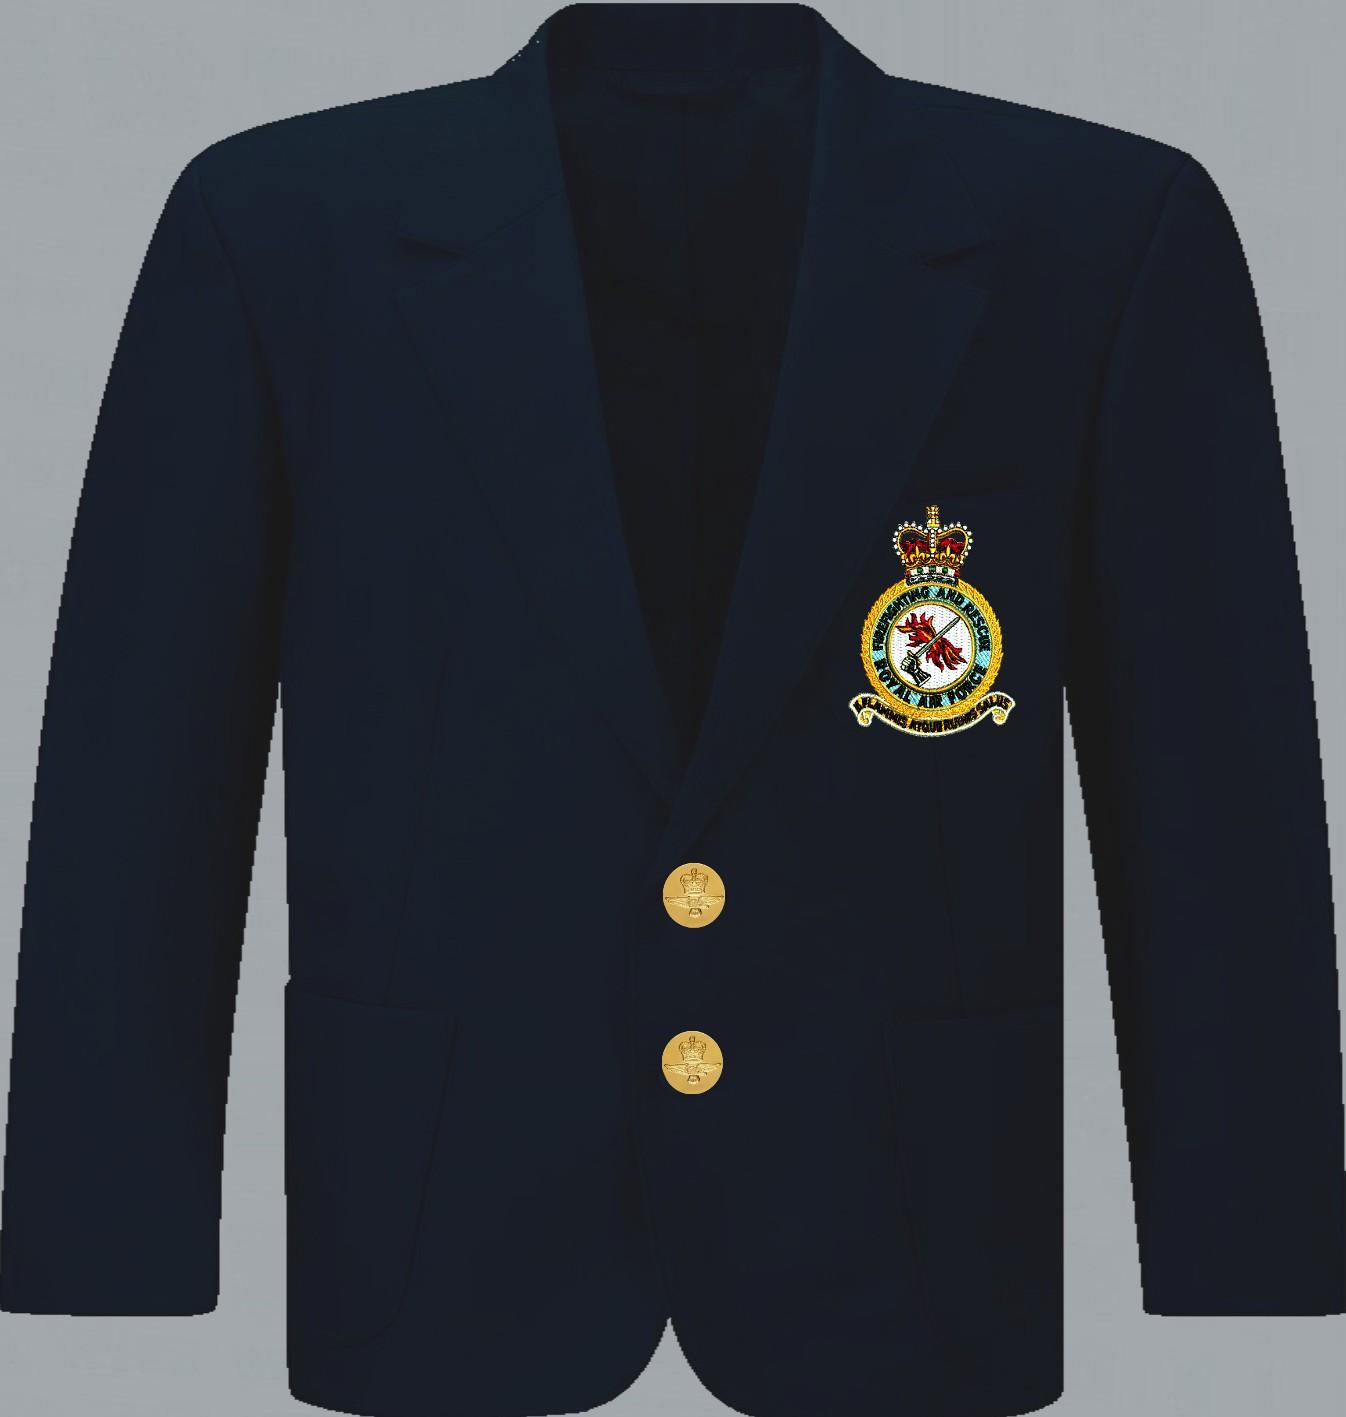 New Lancashire Embroidery  R.A.F Blazer Badge